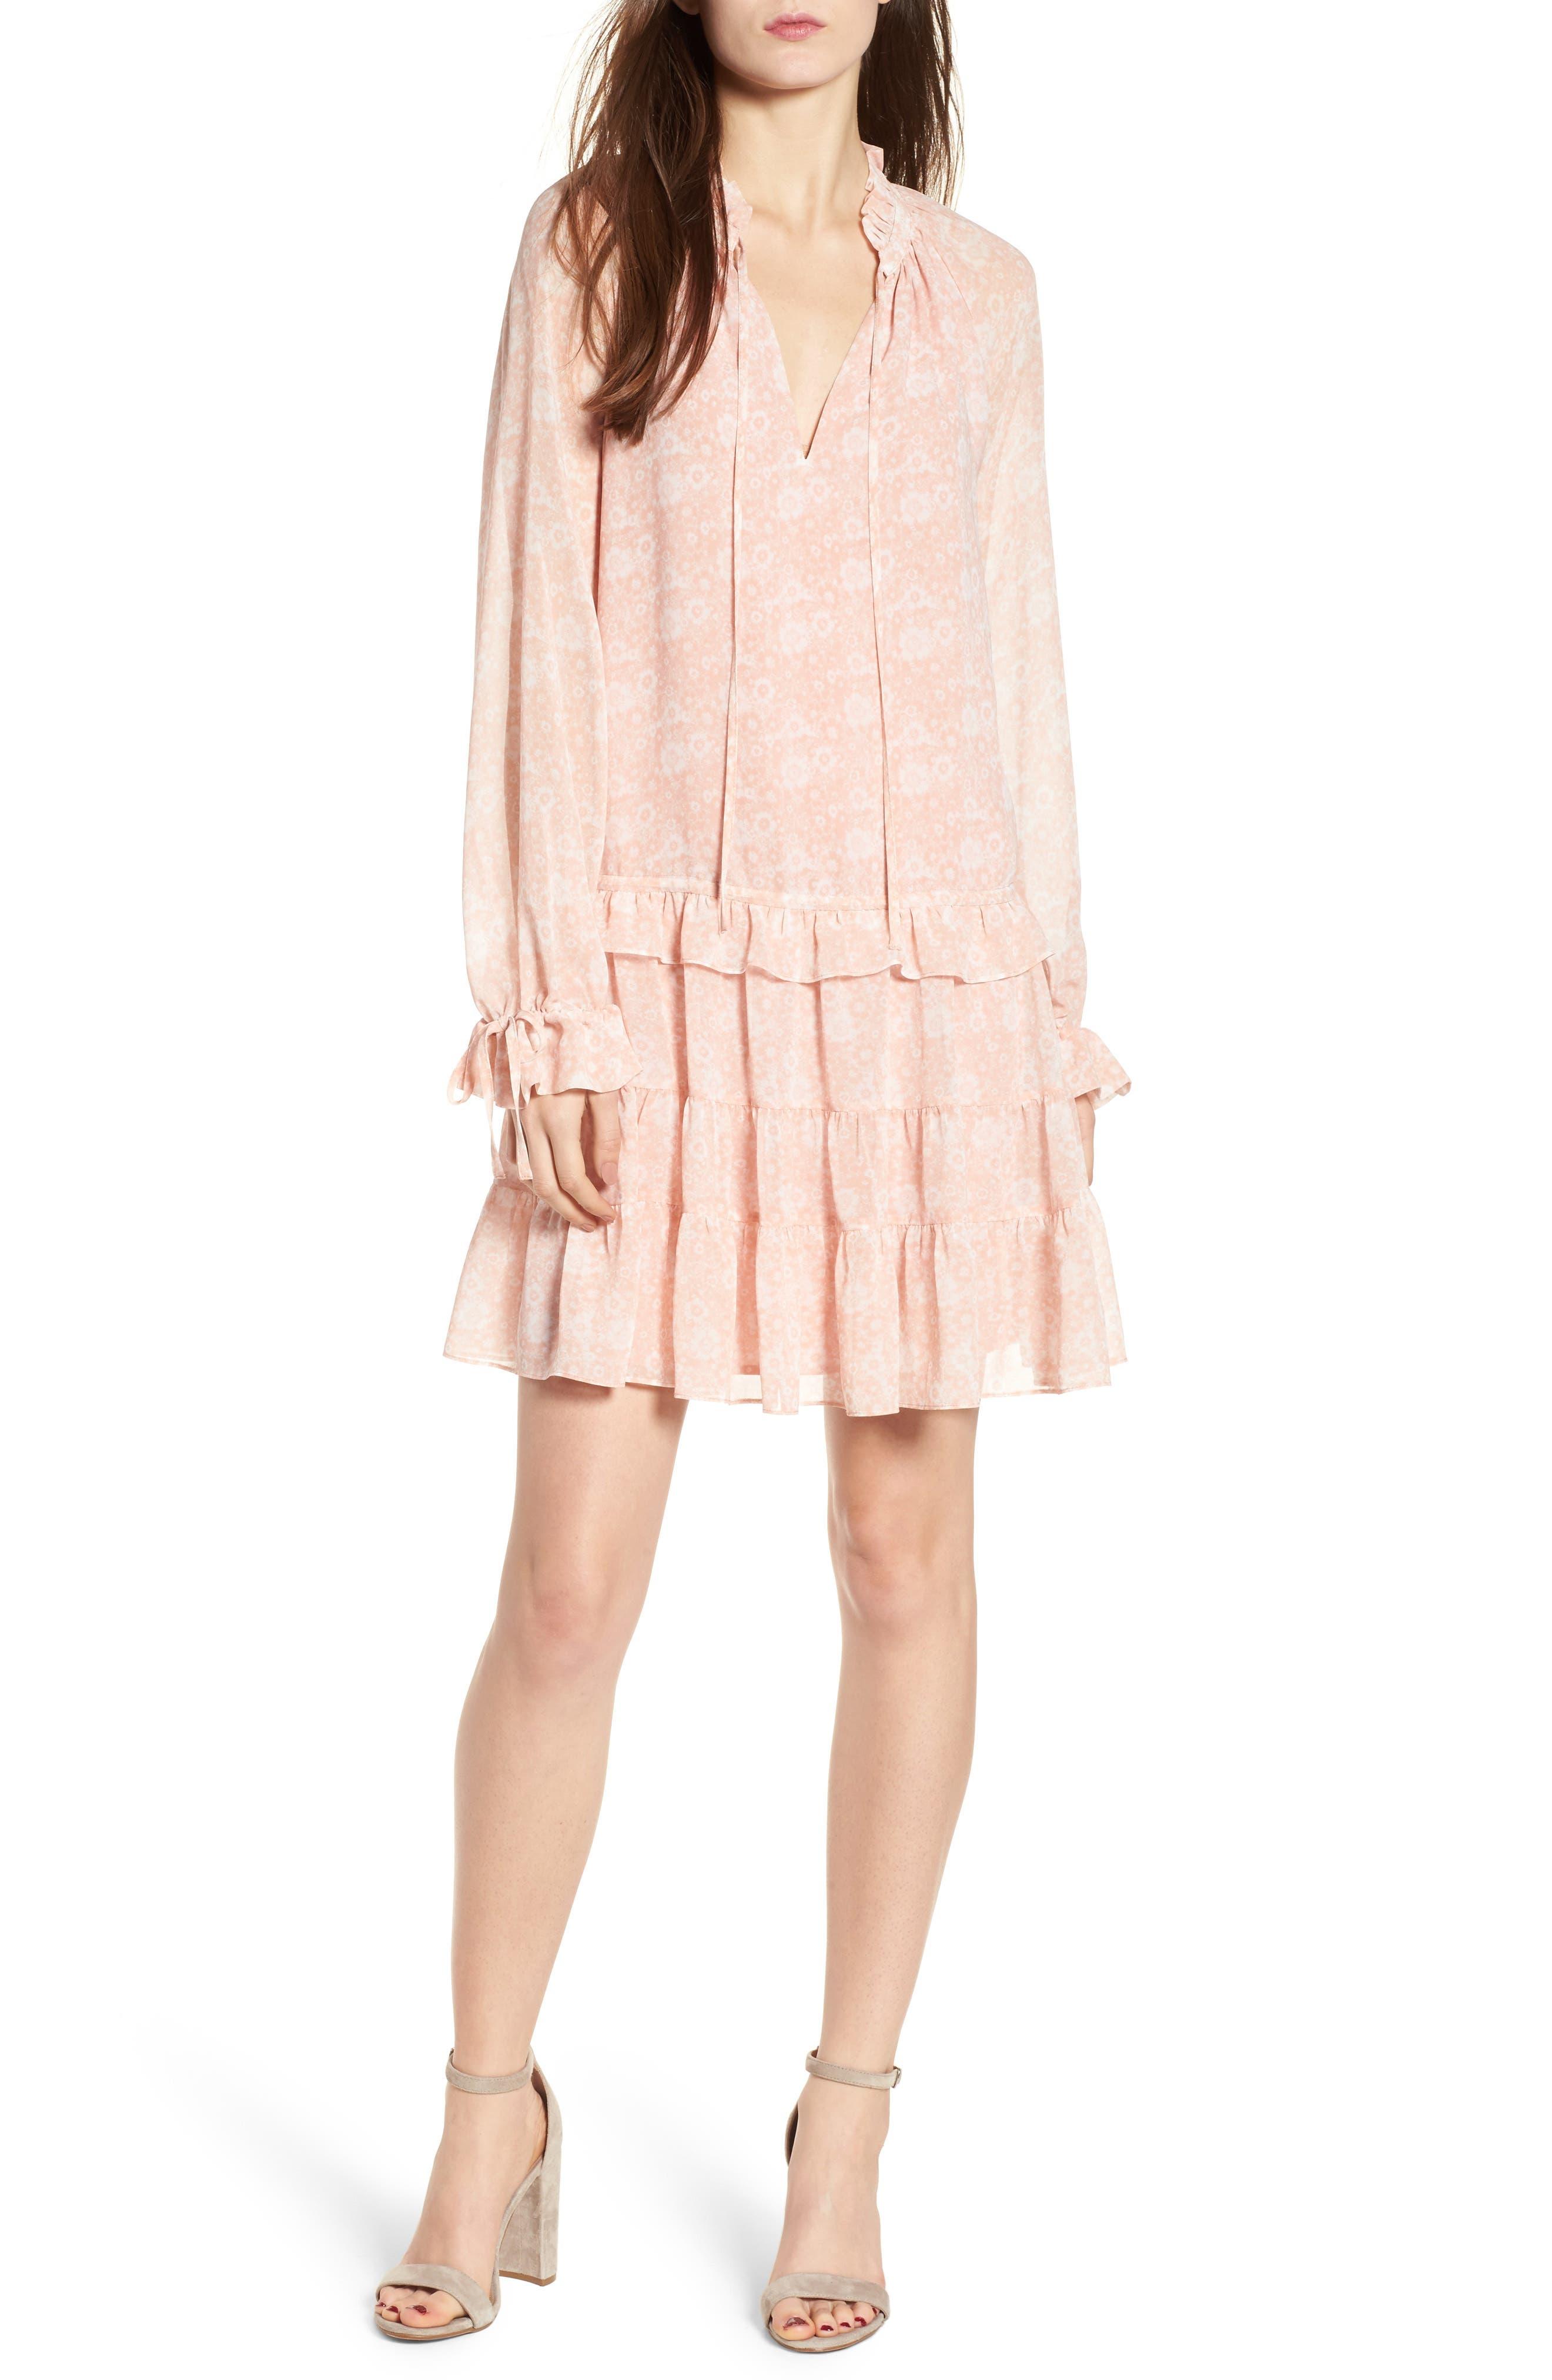 Dylan Drop Waist Dress,                         Main,                         color, Light Pink Multi